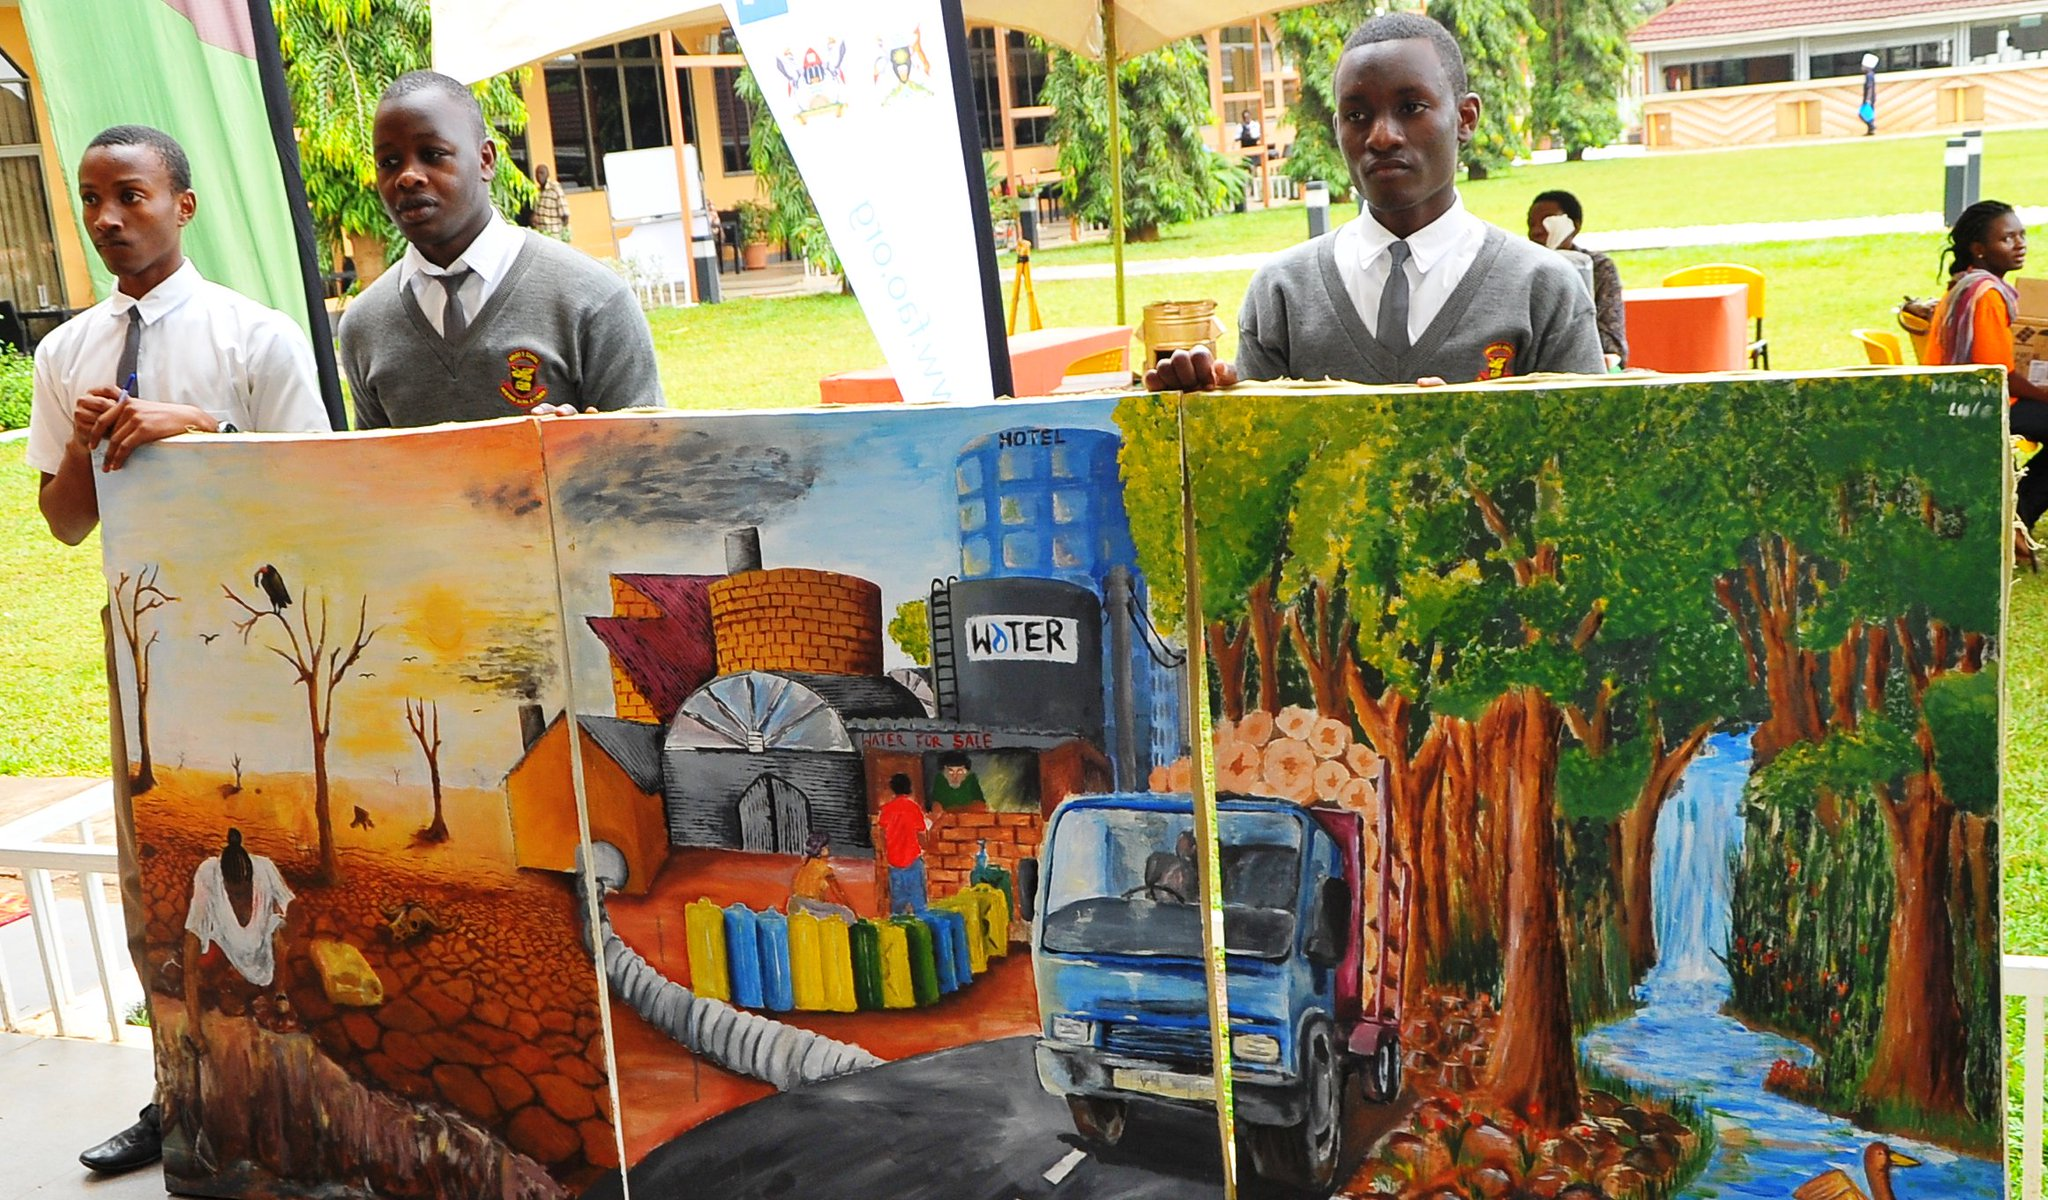 Students at #CBA11 use art to raise awareness about #climatechange @FAOAfrica @IIED @UNDPUganda @MakerereU https://t.co/gxegIxVWIO